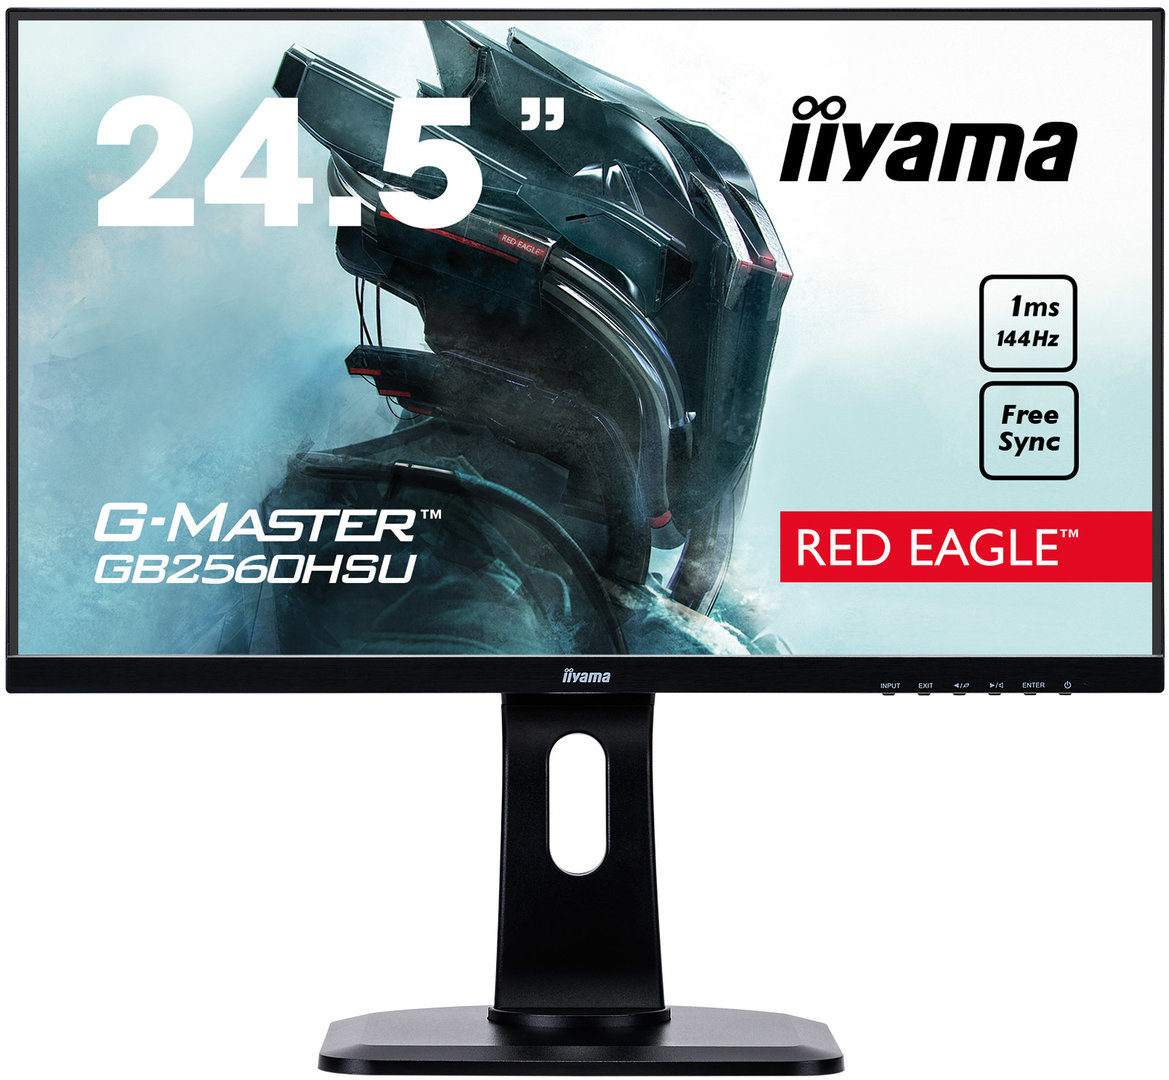 Iiyama G-Master GB2560HSU-B1 Red Eagle